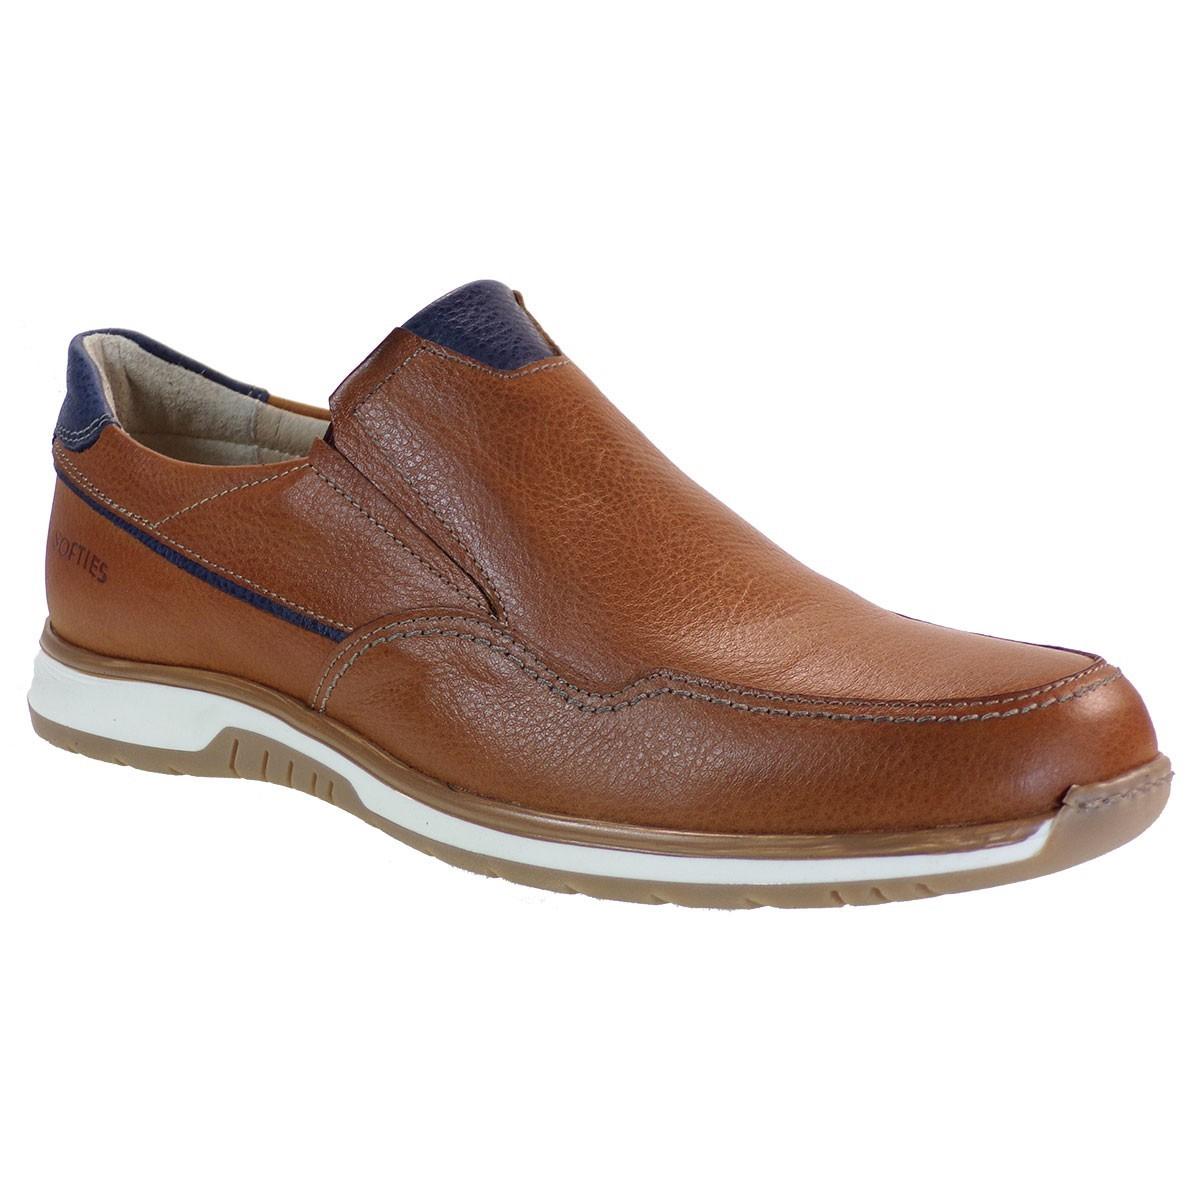 Softies Ανδρικά Παπούτσια 6111 Ταμπά Δέρμα